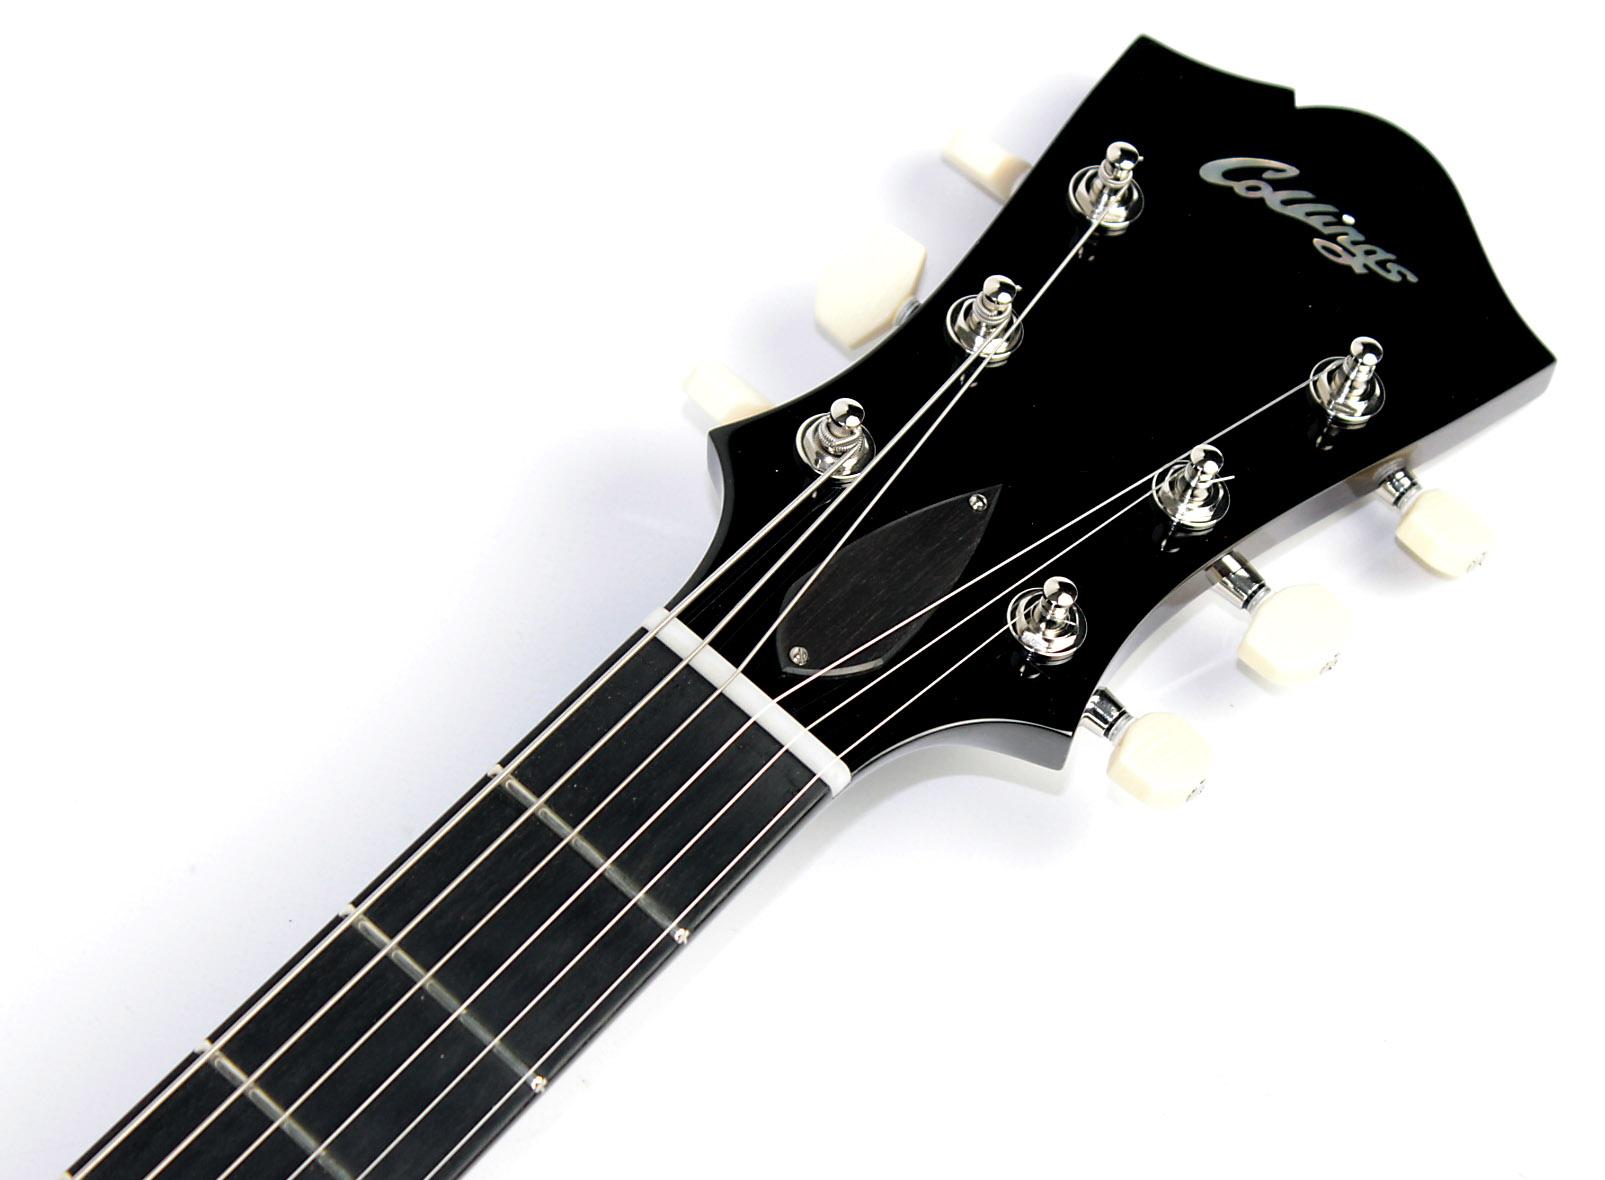 collings statesman lc 2016 tobacco sunburst guitar for sale. Black Bedroom Furniture Sets. Home Design Ideas